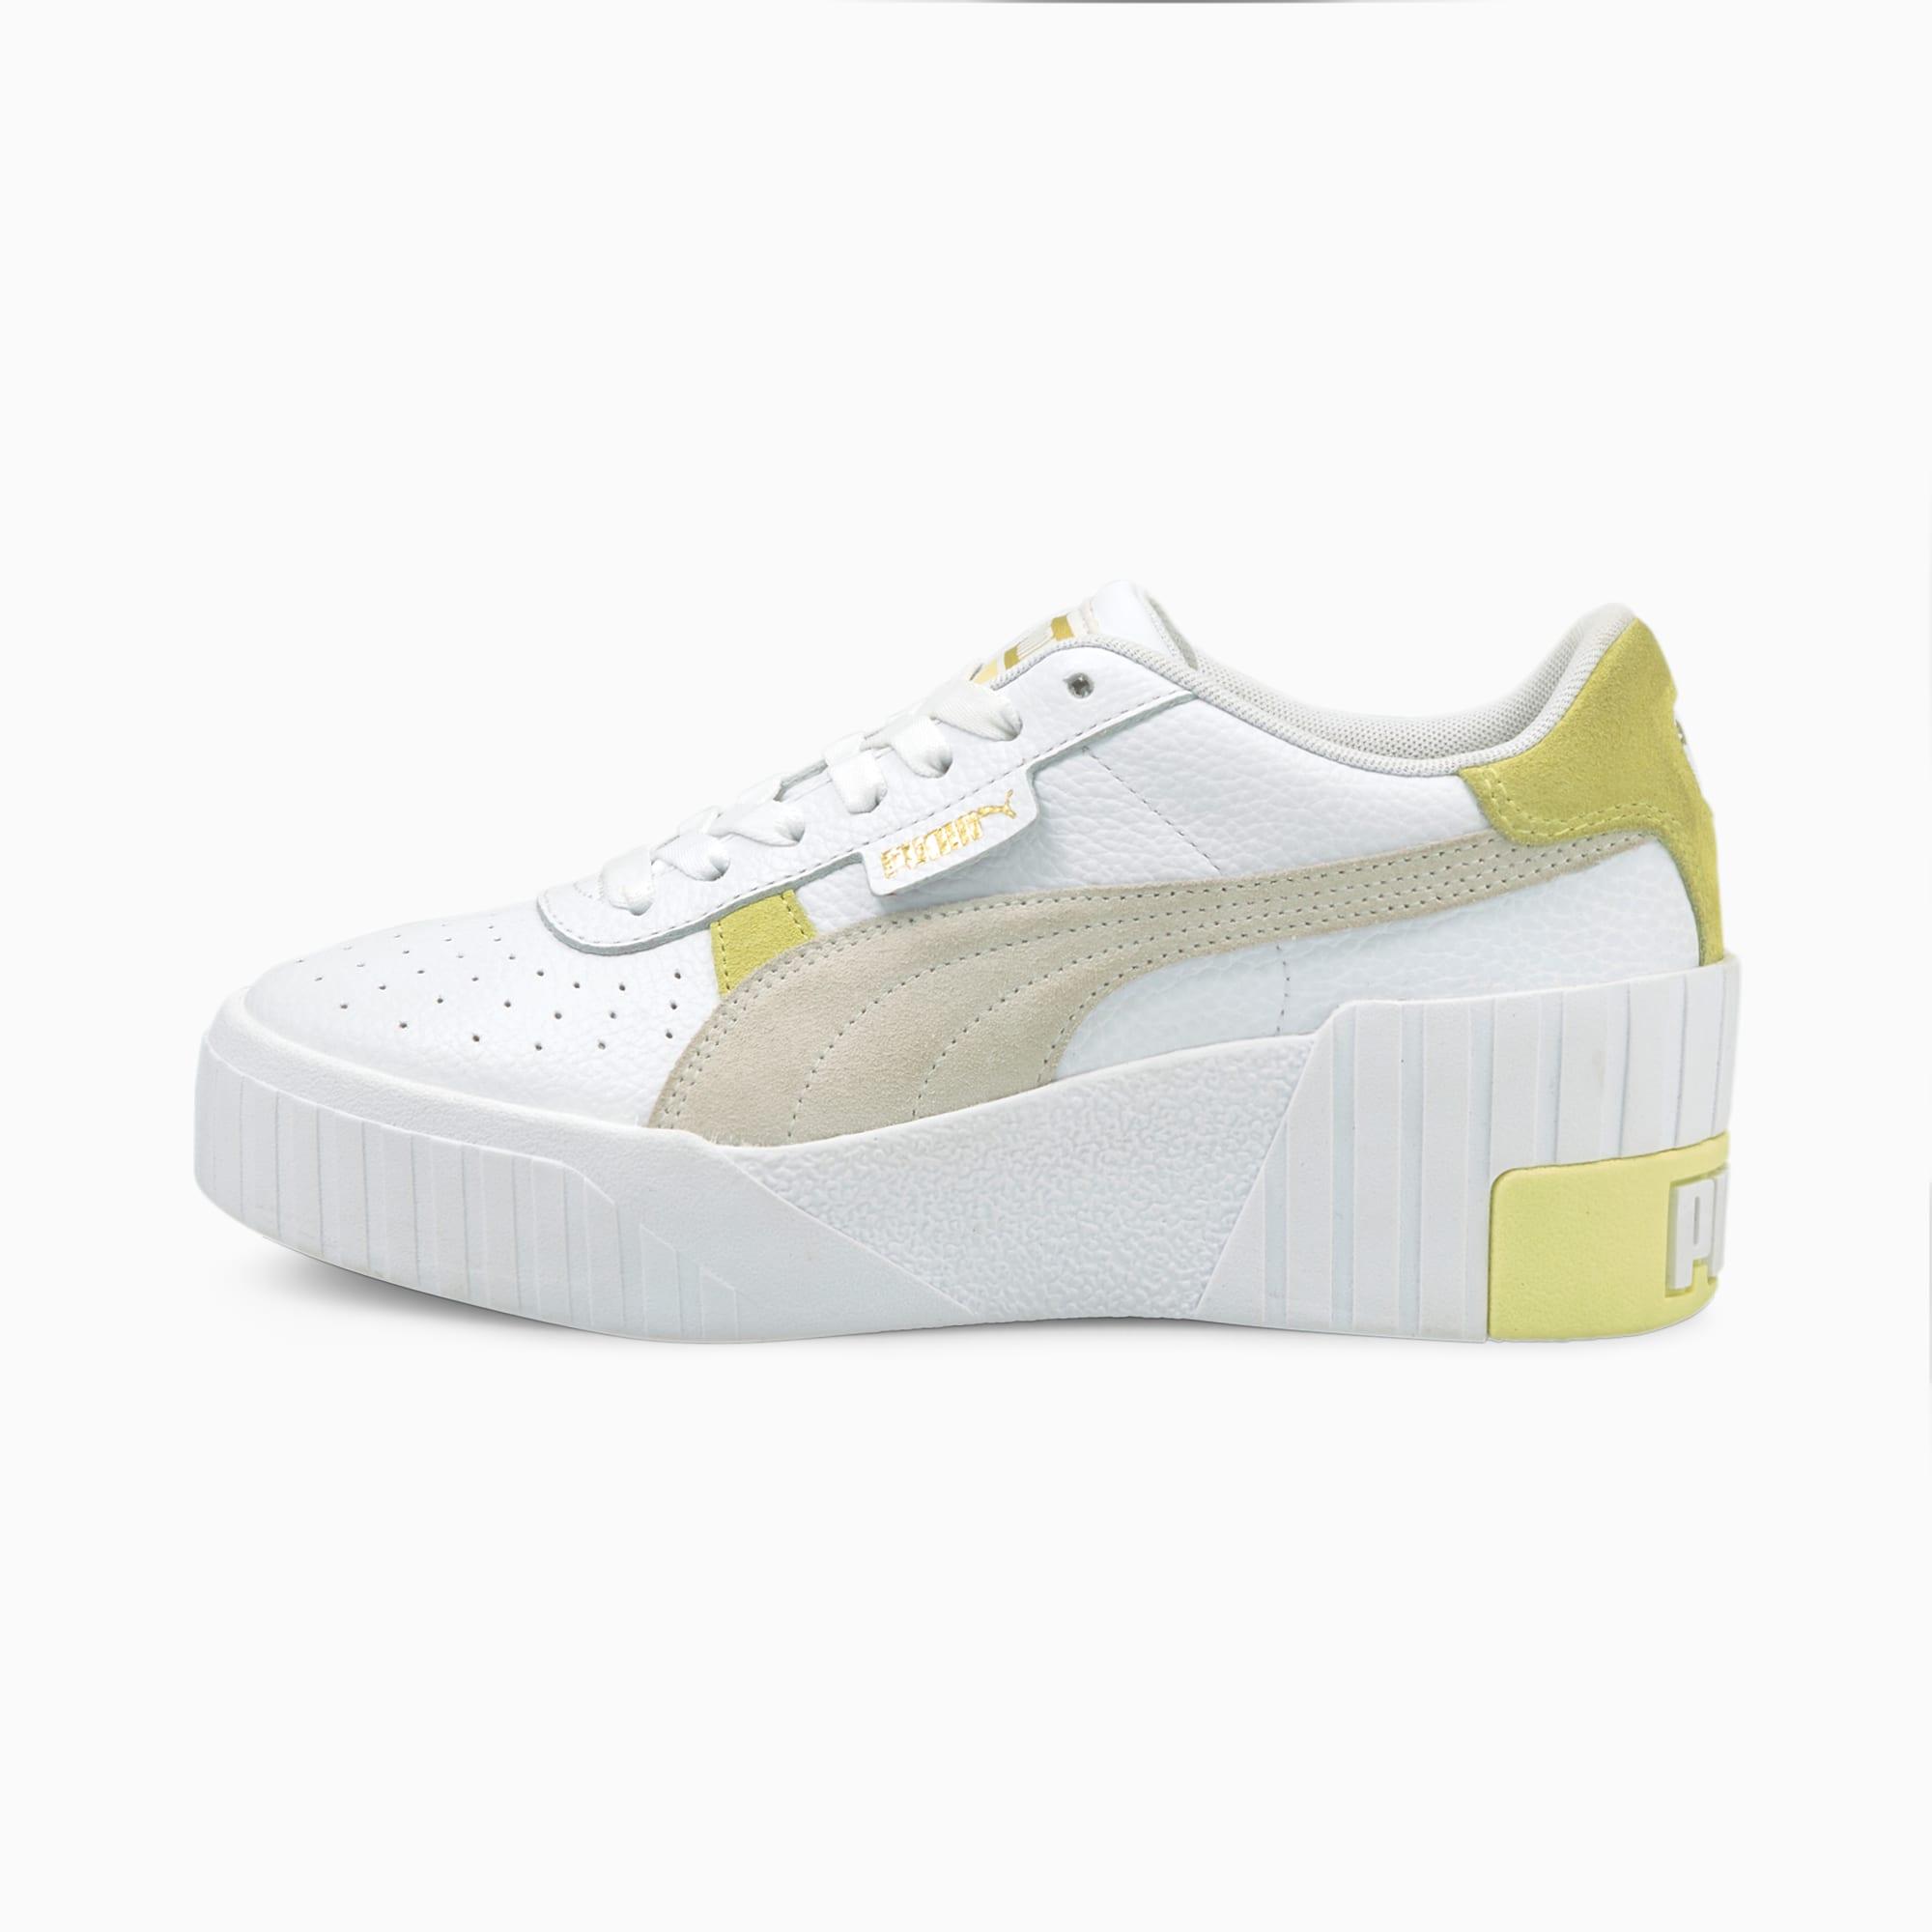 Cali Wedge Mix Women's Sneakers